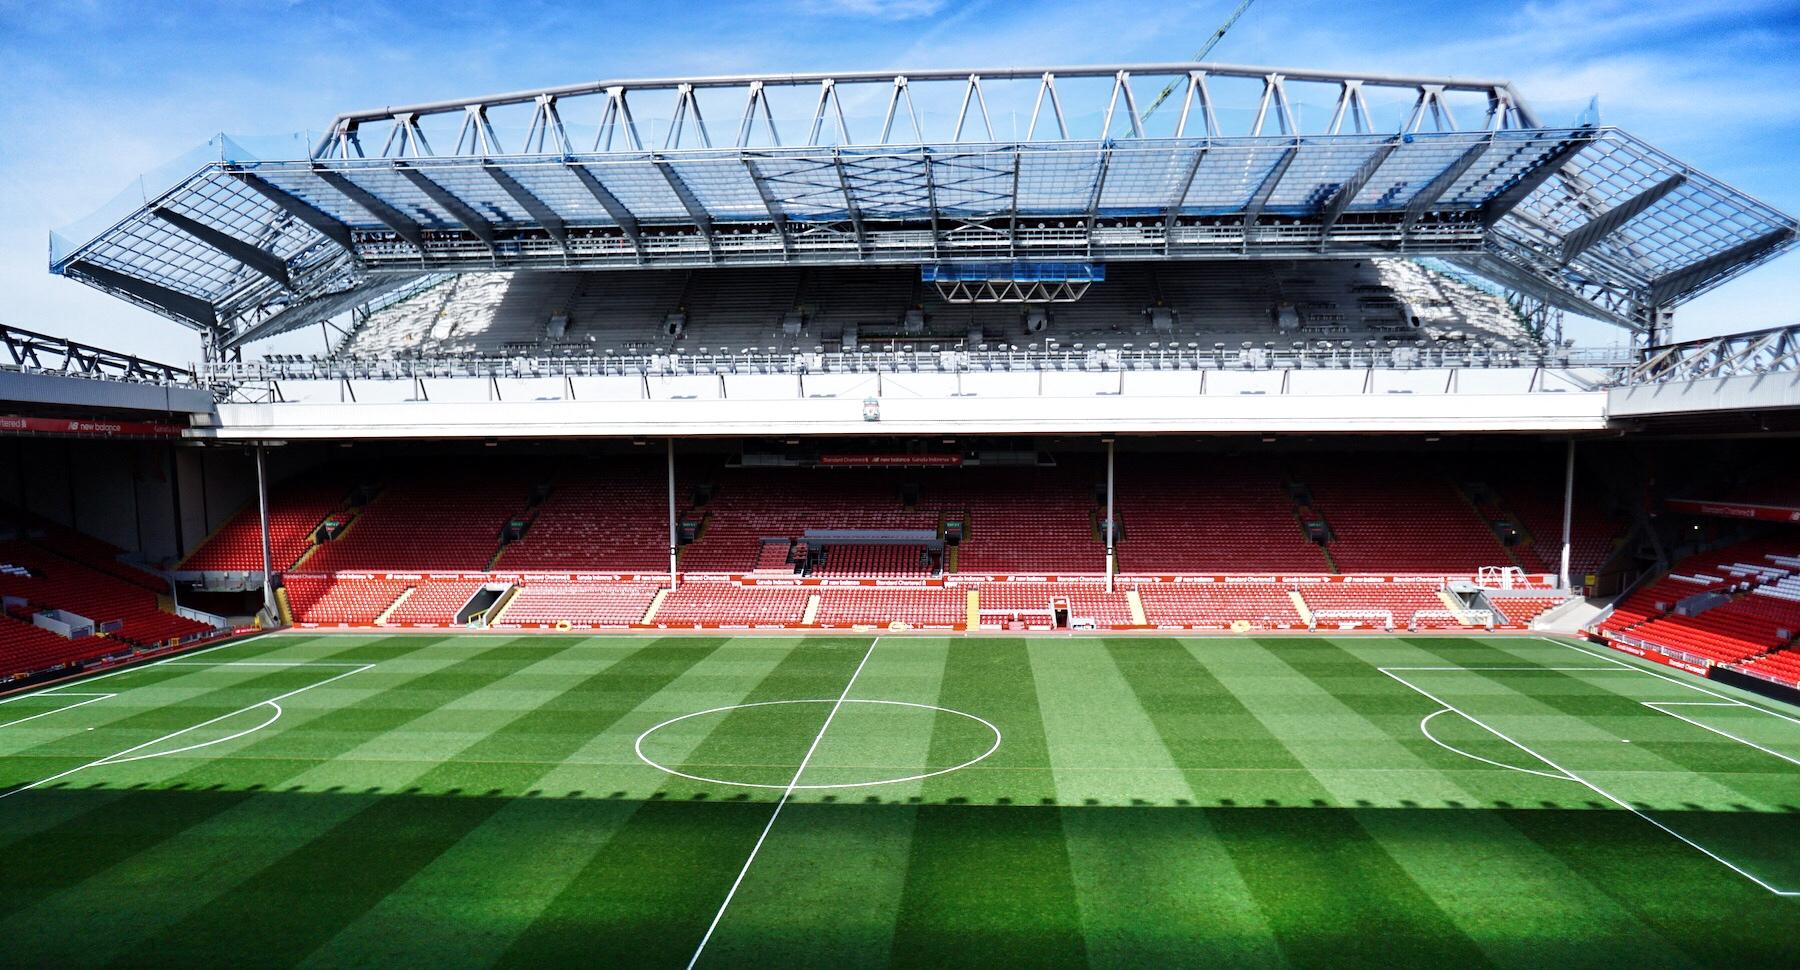 Anfield, Liverpool - TheFebruaryFox.com